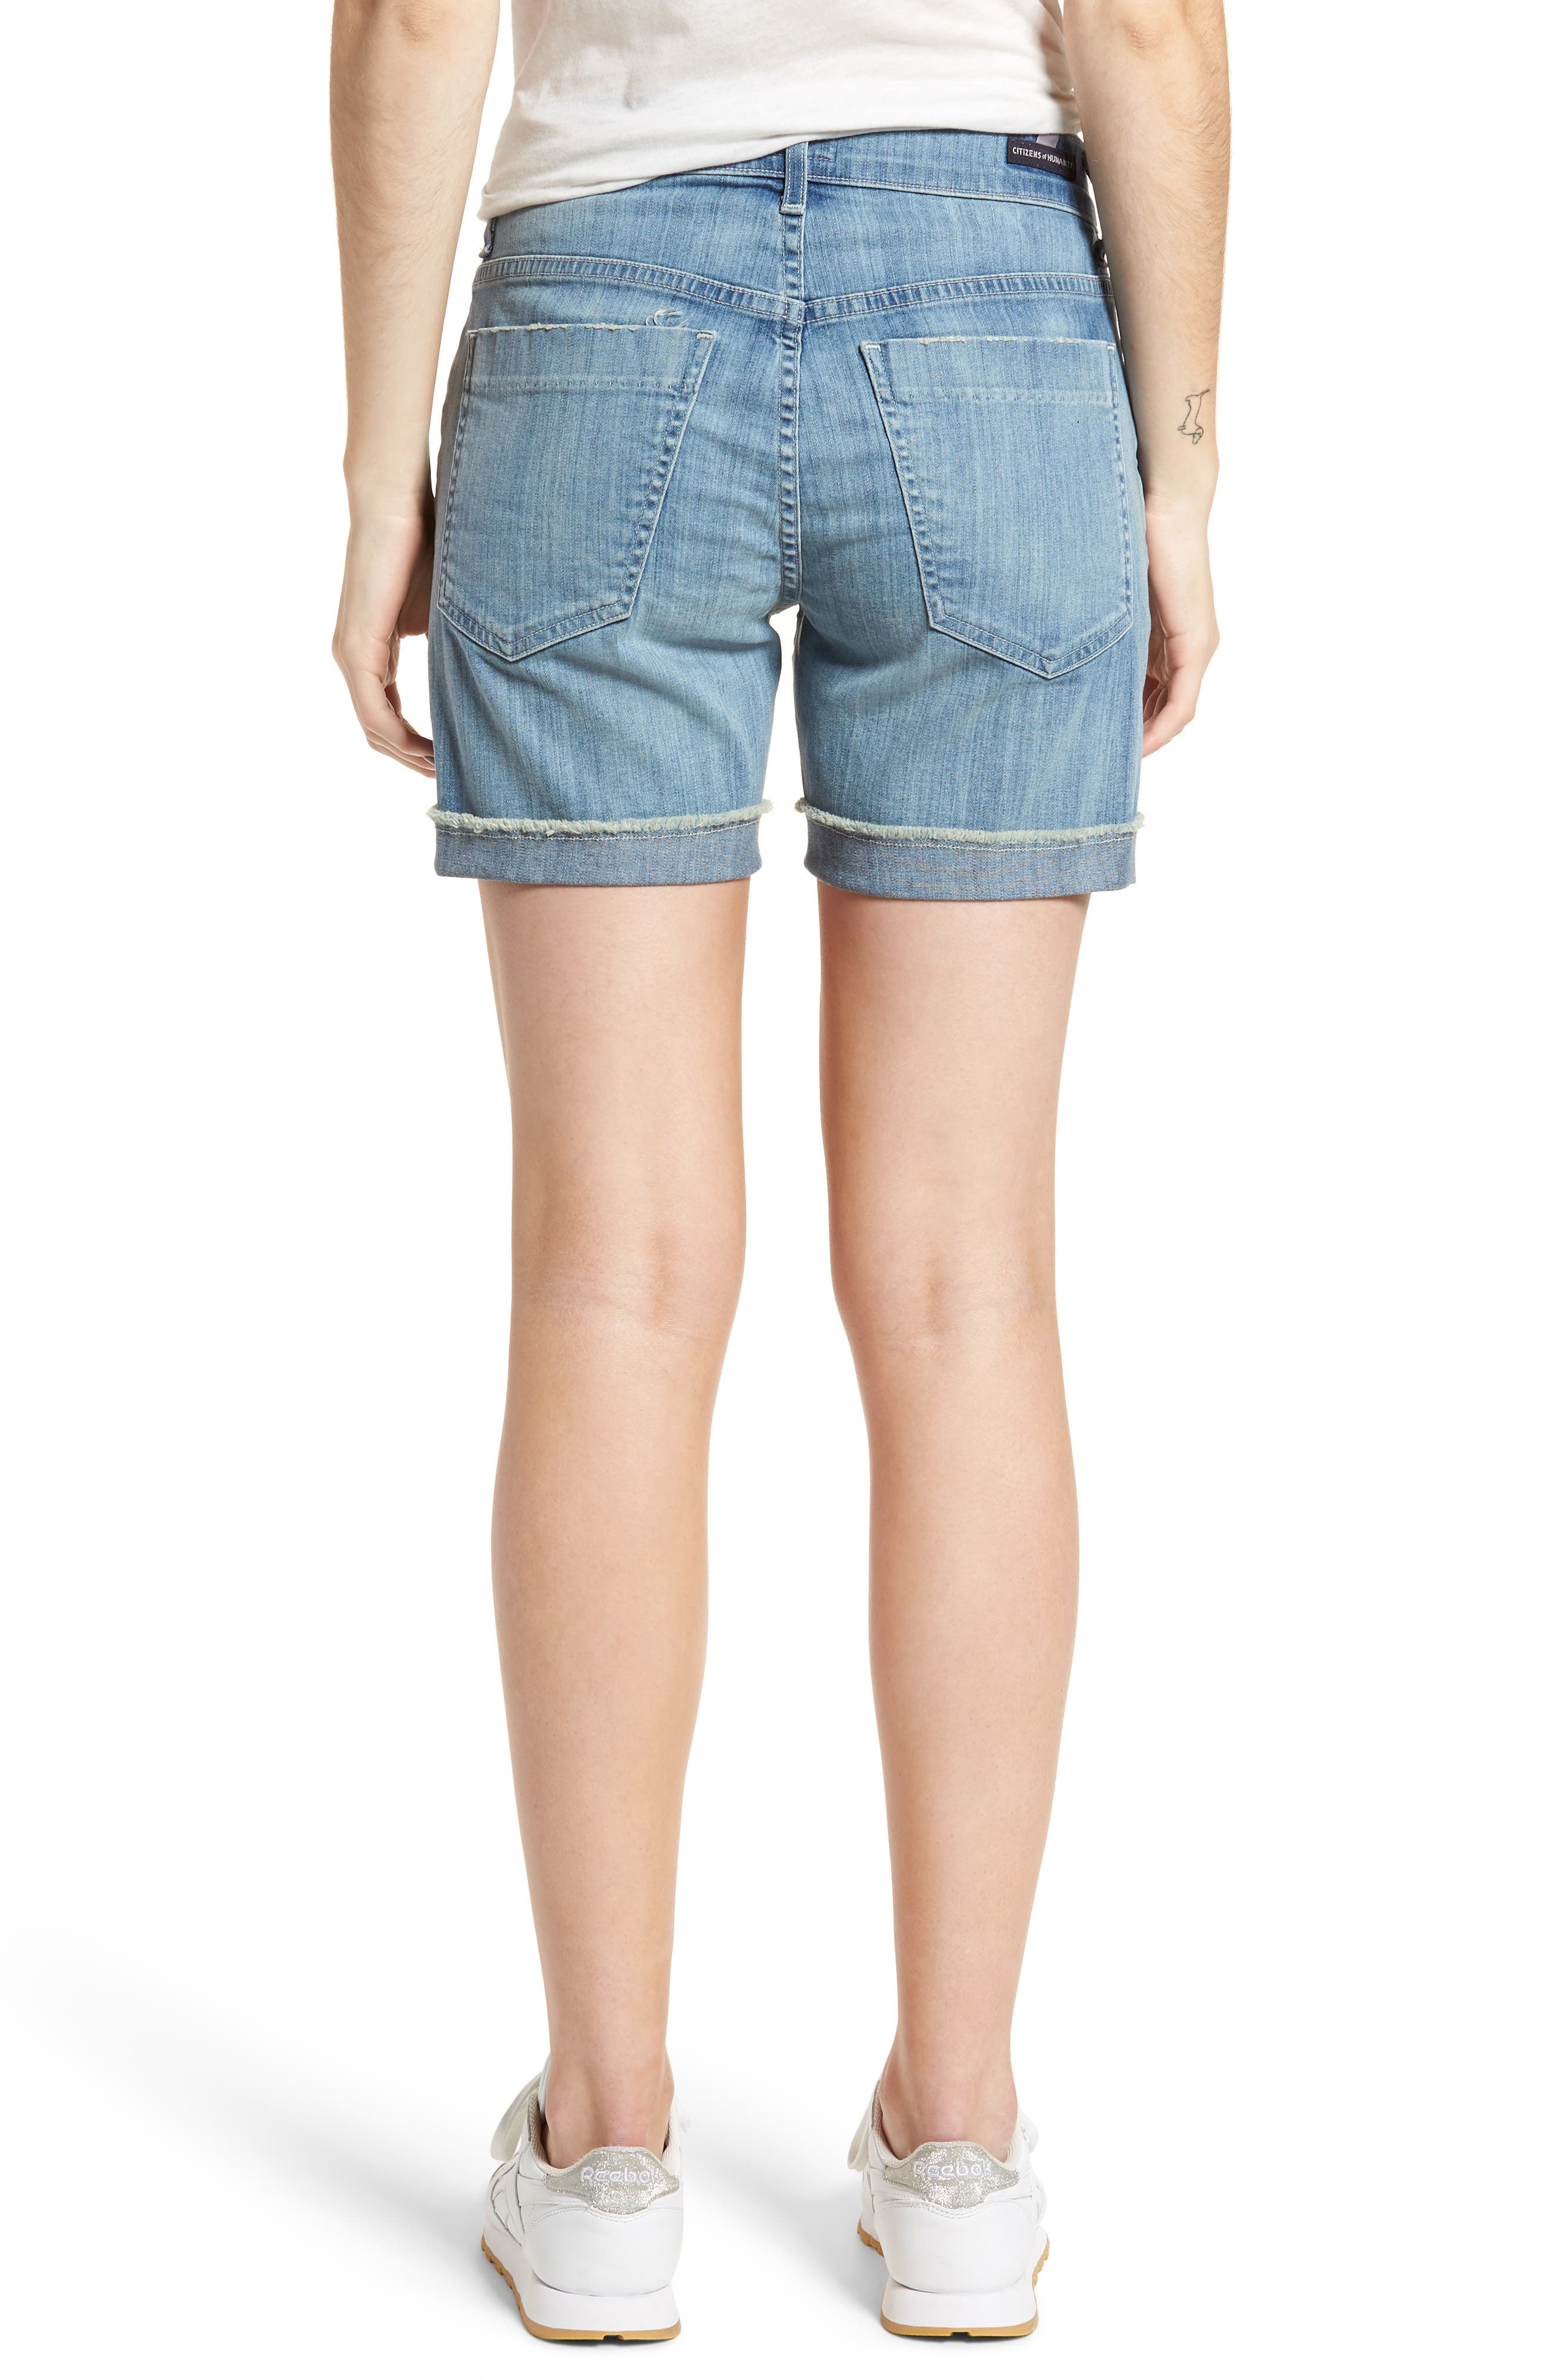 Skyler Denim Shorts,                             Alternate thumbnail 2, color,                             Mercury